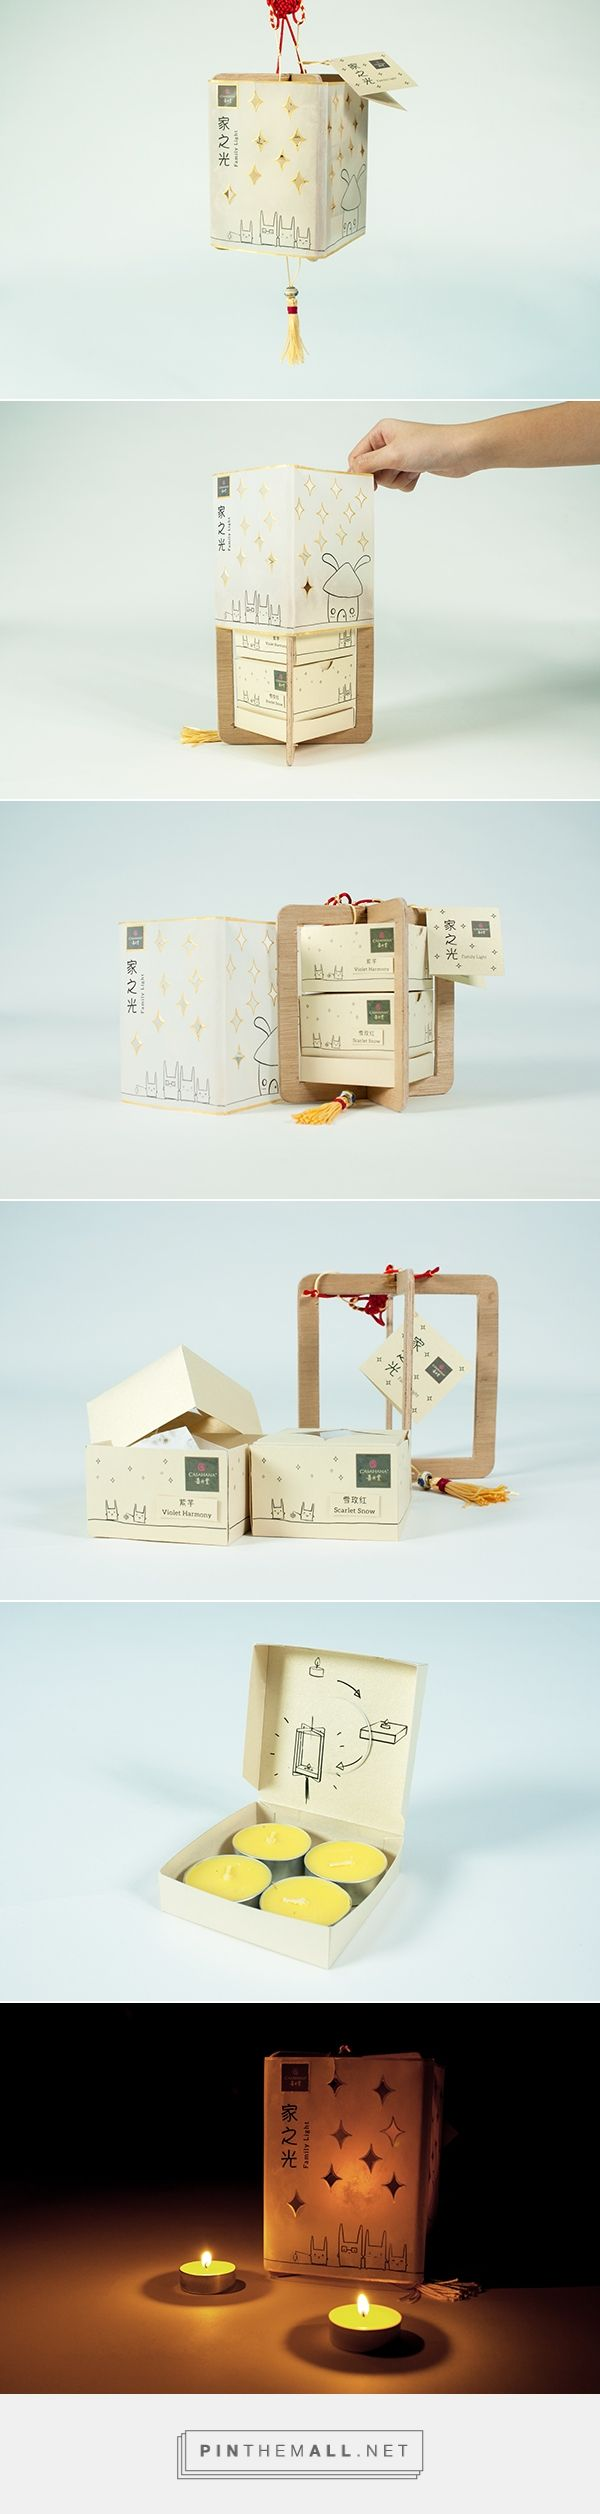 Family Light - Mooncake Packaging on Behance - created via http://pinthemall.net